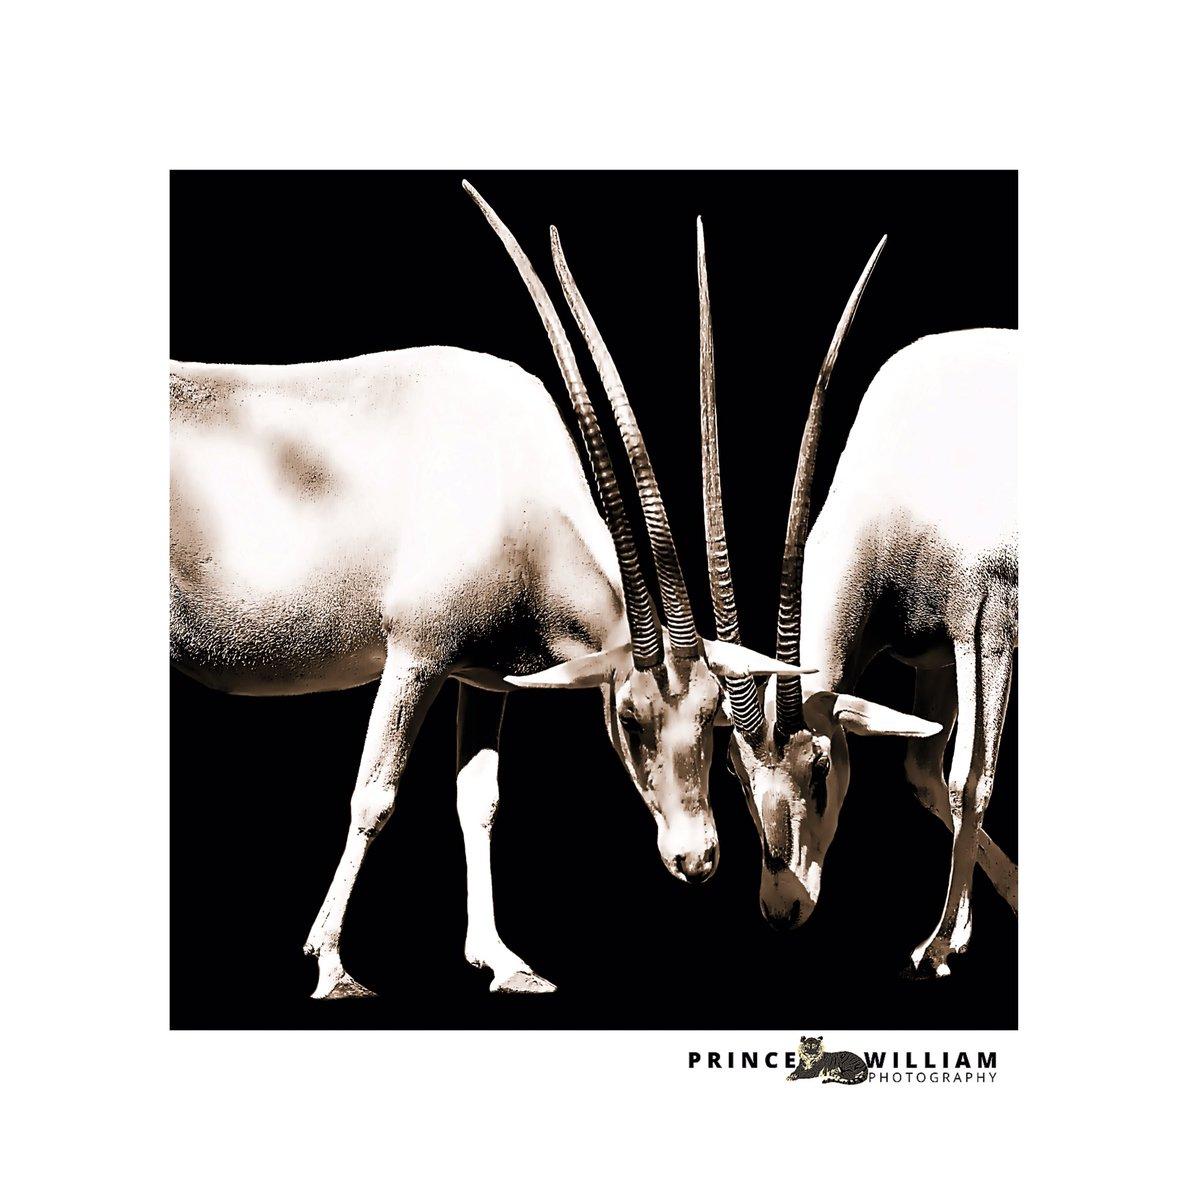 Meeting brother #naturephotos #wildlifephotography #wildnature #photoshoot #toulouse #safari #france #photography #siberiantiger #animallover #animal #savetigers #respectanimals #photooftheday #safari #canon1dxmarkii #canonphotography #canonportrait #canonwildlifephotography